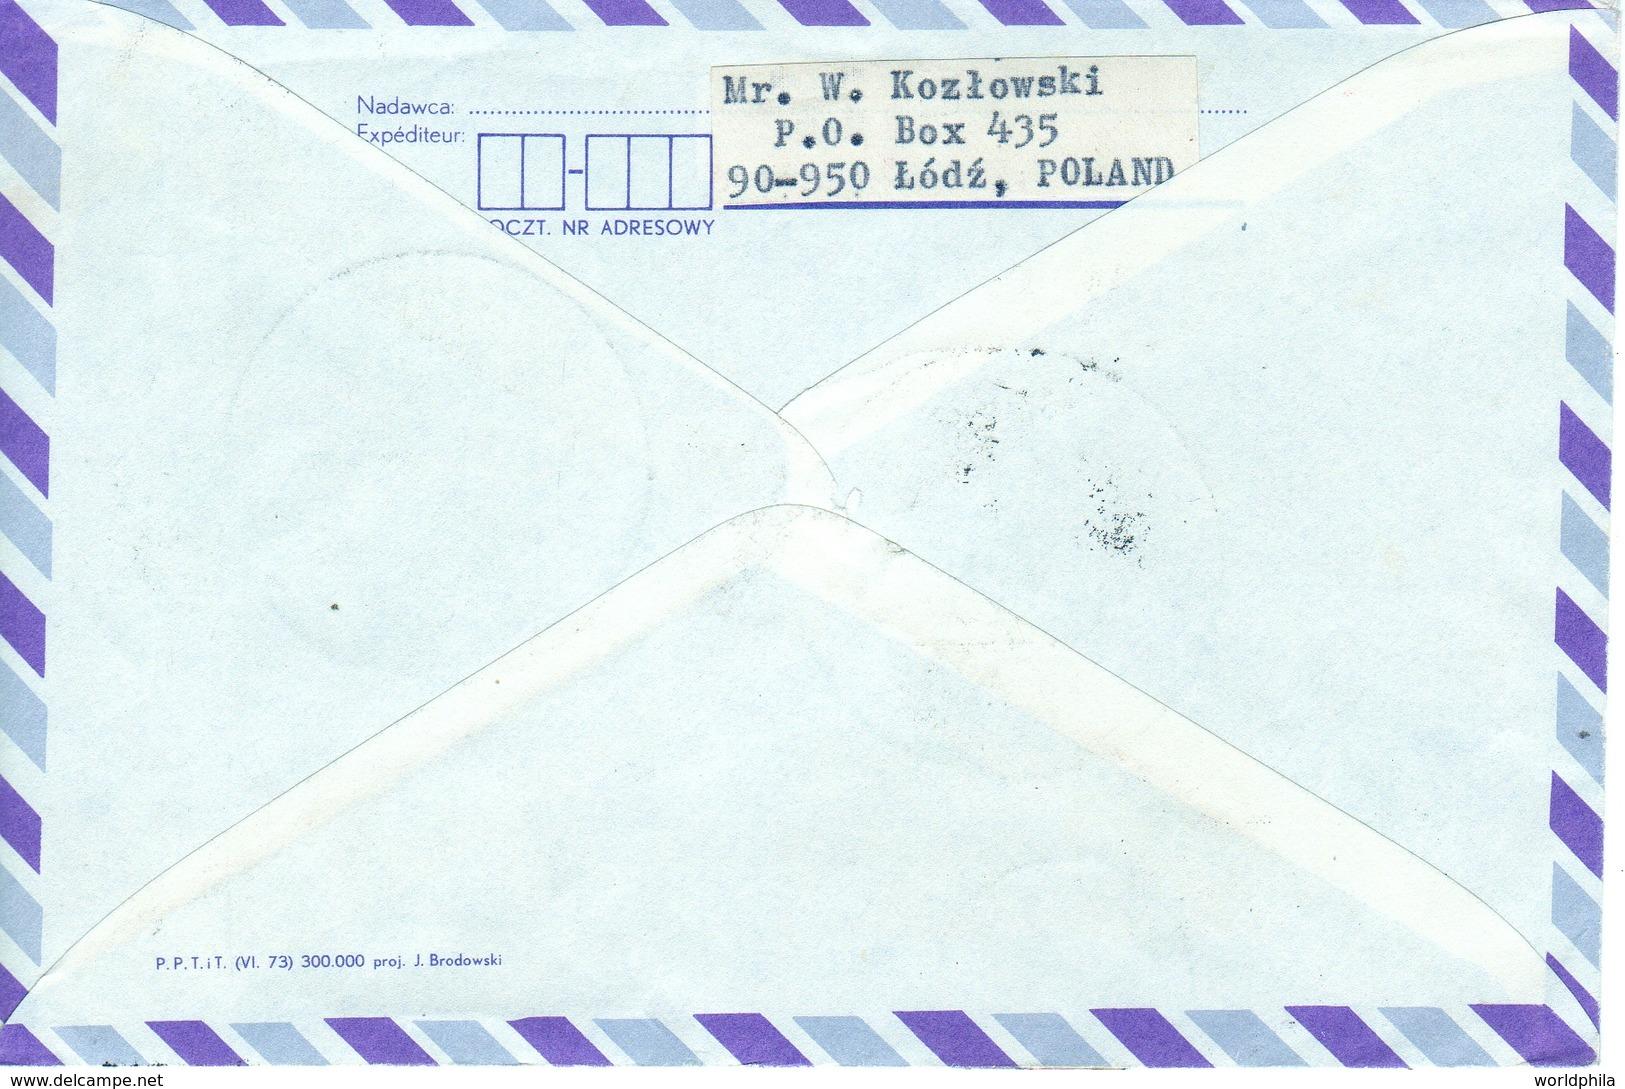 Poland-Israel 1973 Exhibition Registered Aerogramme Nicolaus Copernicus Matematichian & Astronomer VII - Astronomy